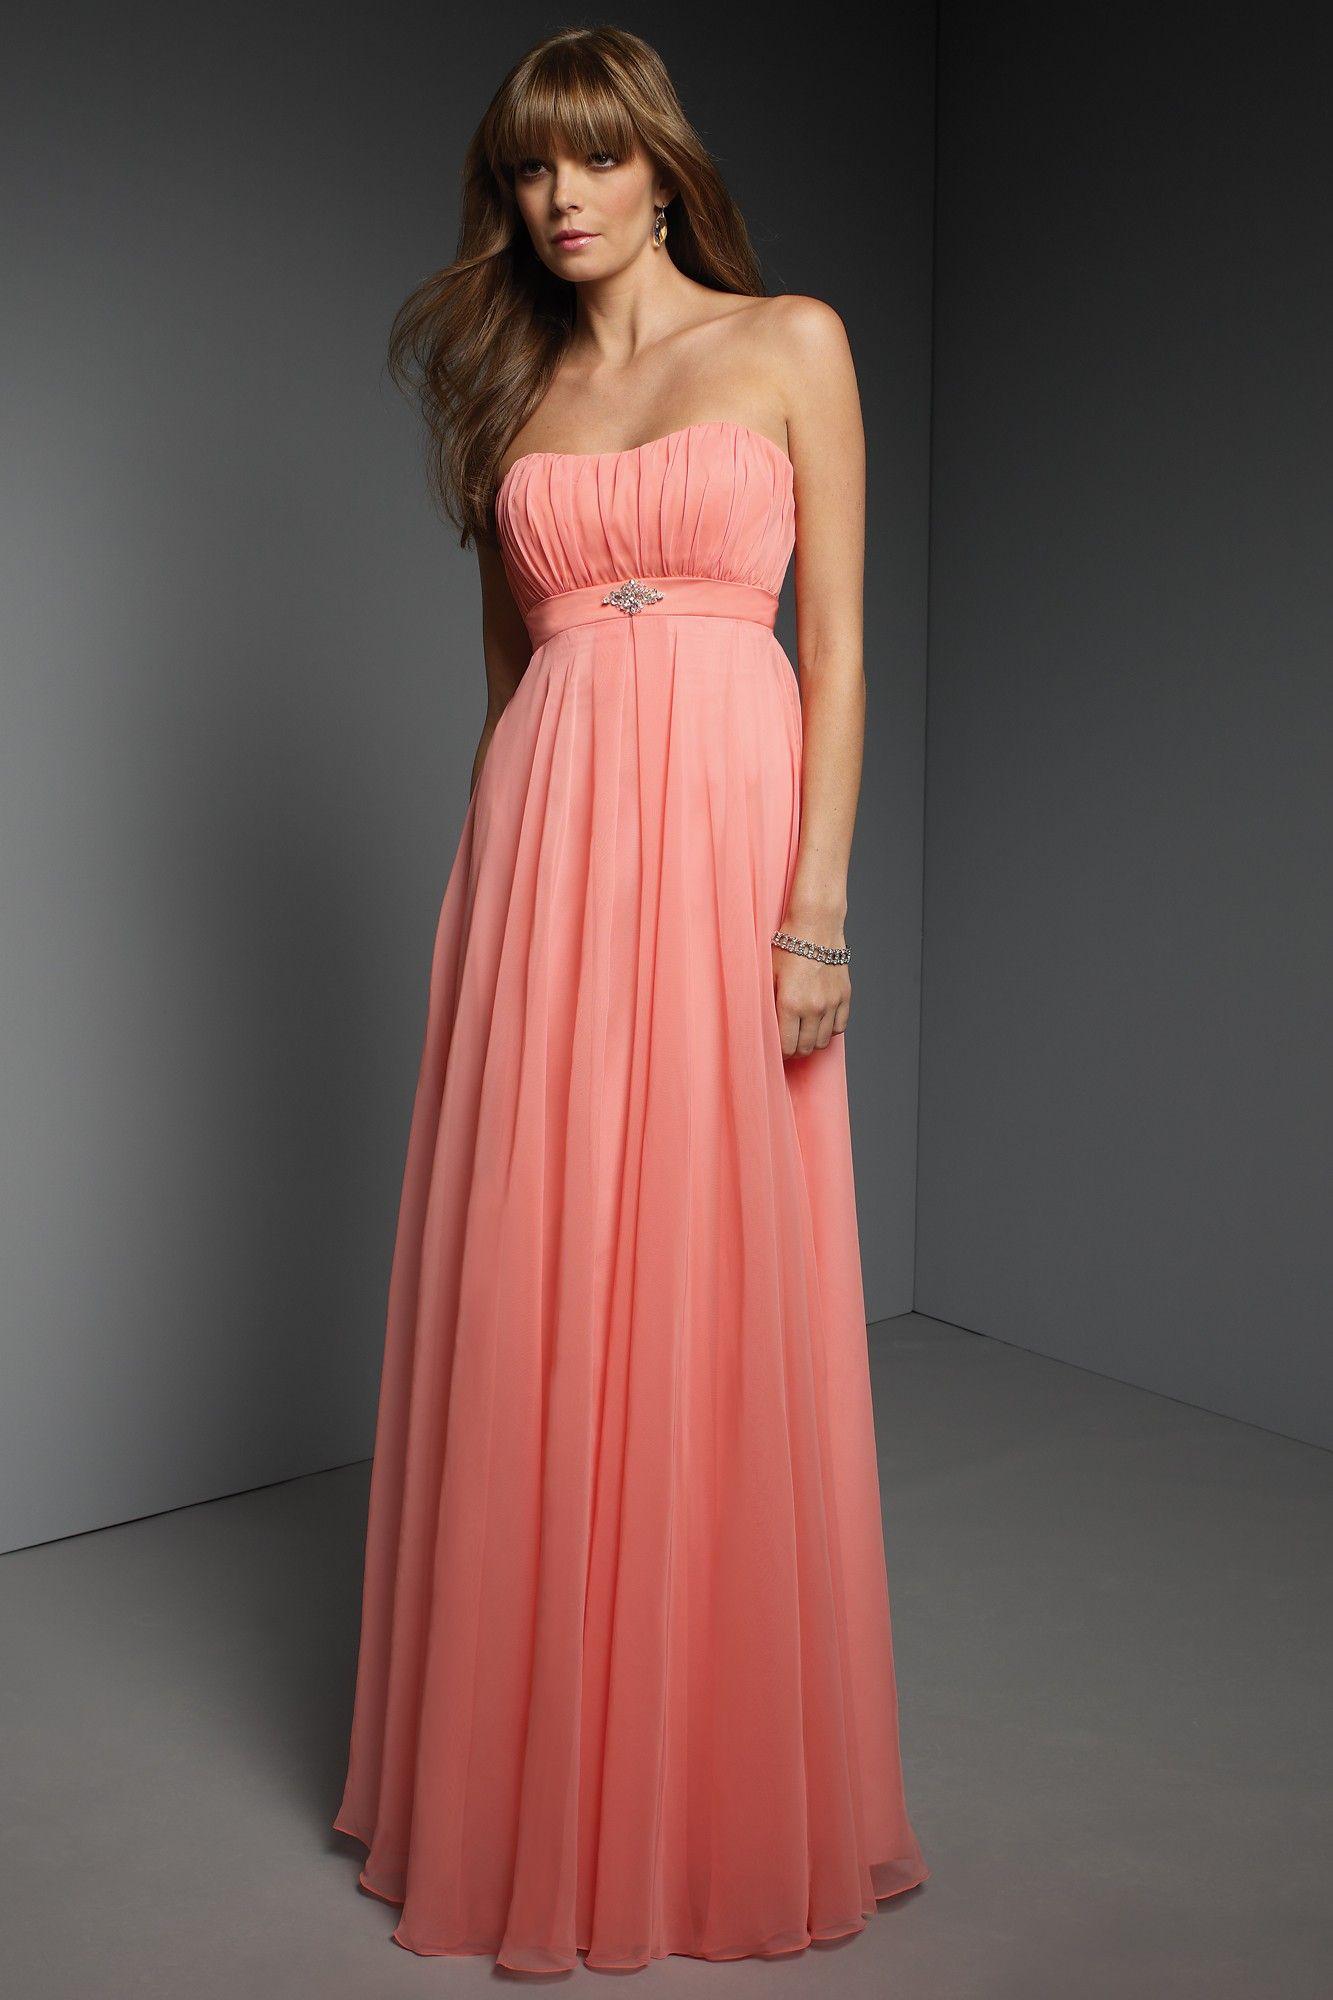 light coral bridesmaid dresses | Wedding Ideas | Pinterest | Coral ...